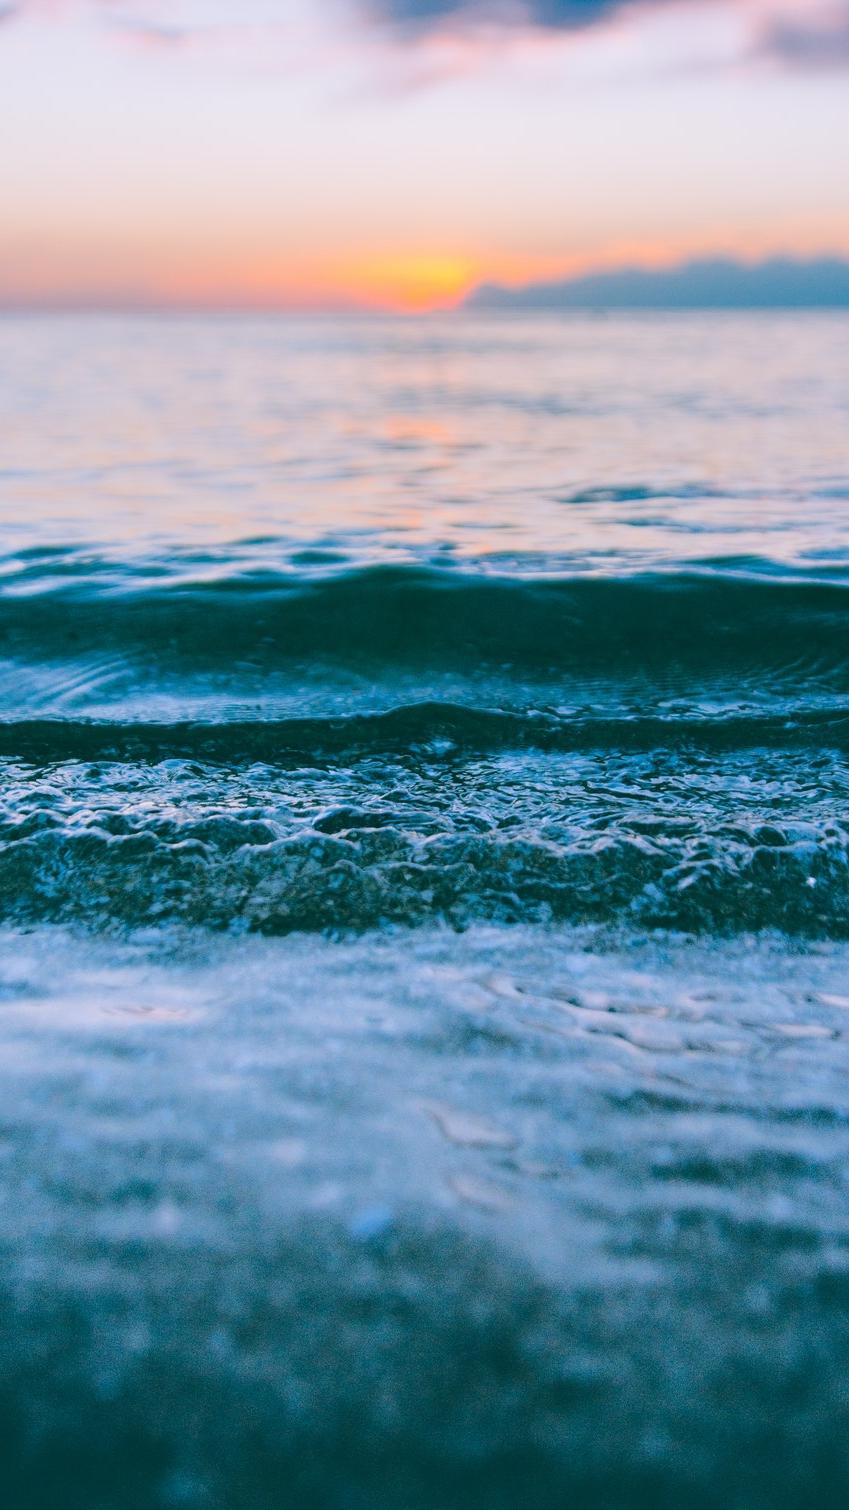 Marvel Iphone Wallpaper Beach Ocean Blue Water Waves Iphone Wallpaper Iphone